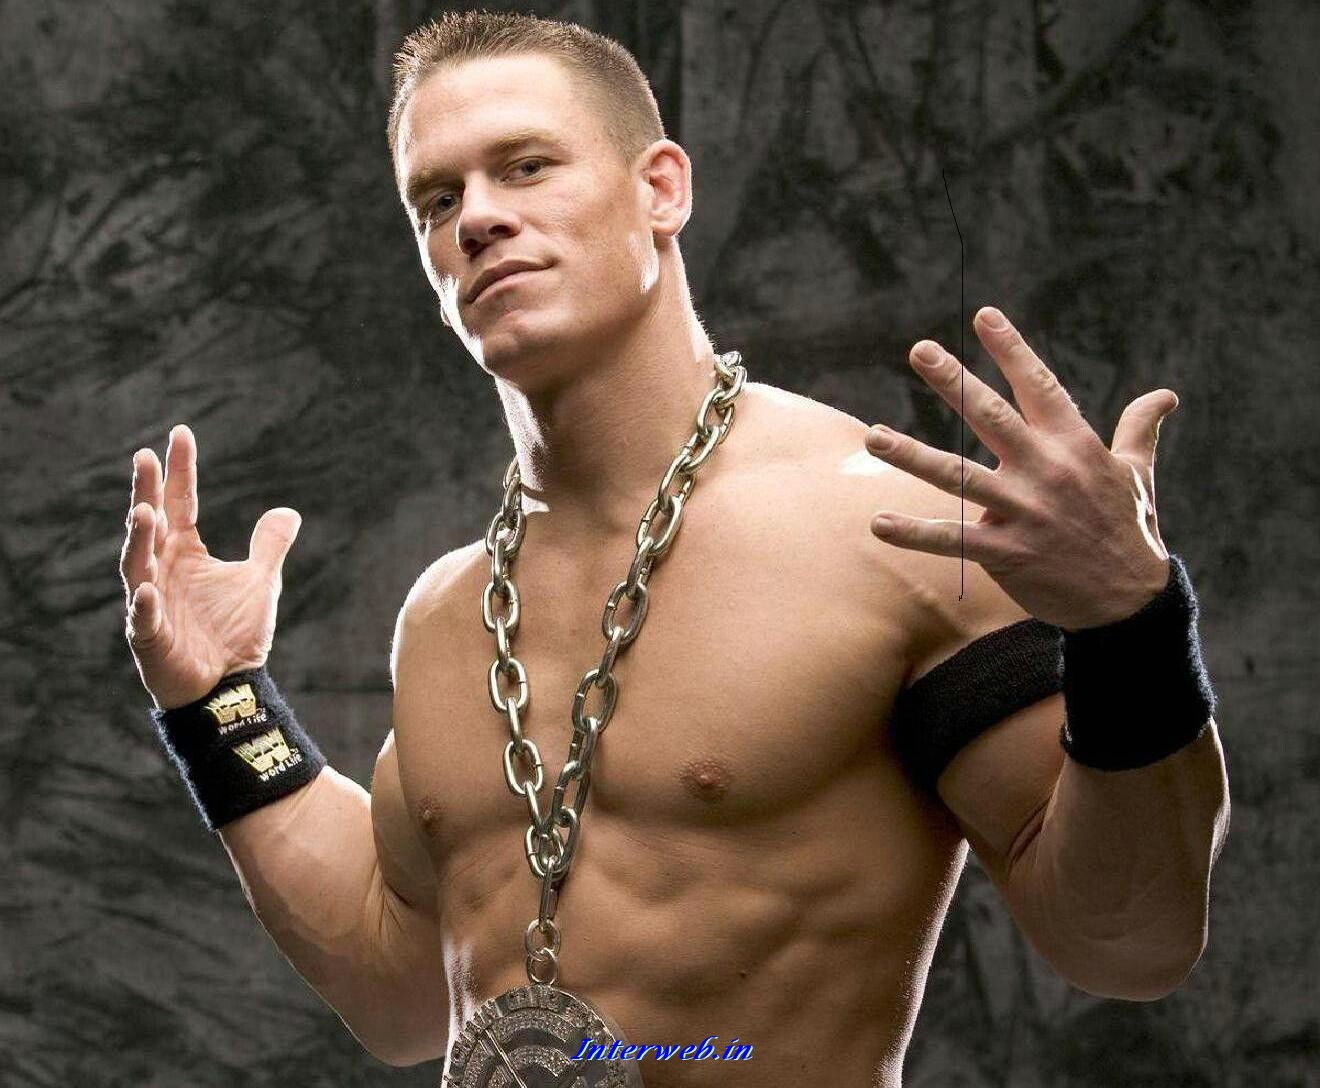 John Cena Wwe Wallpapers Hd The Nology